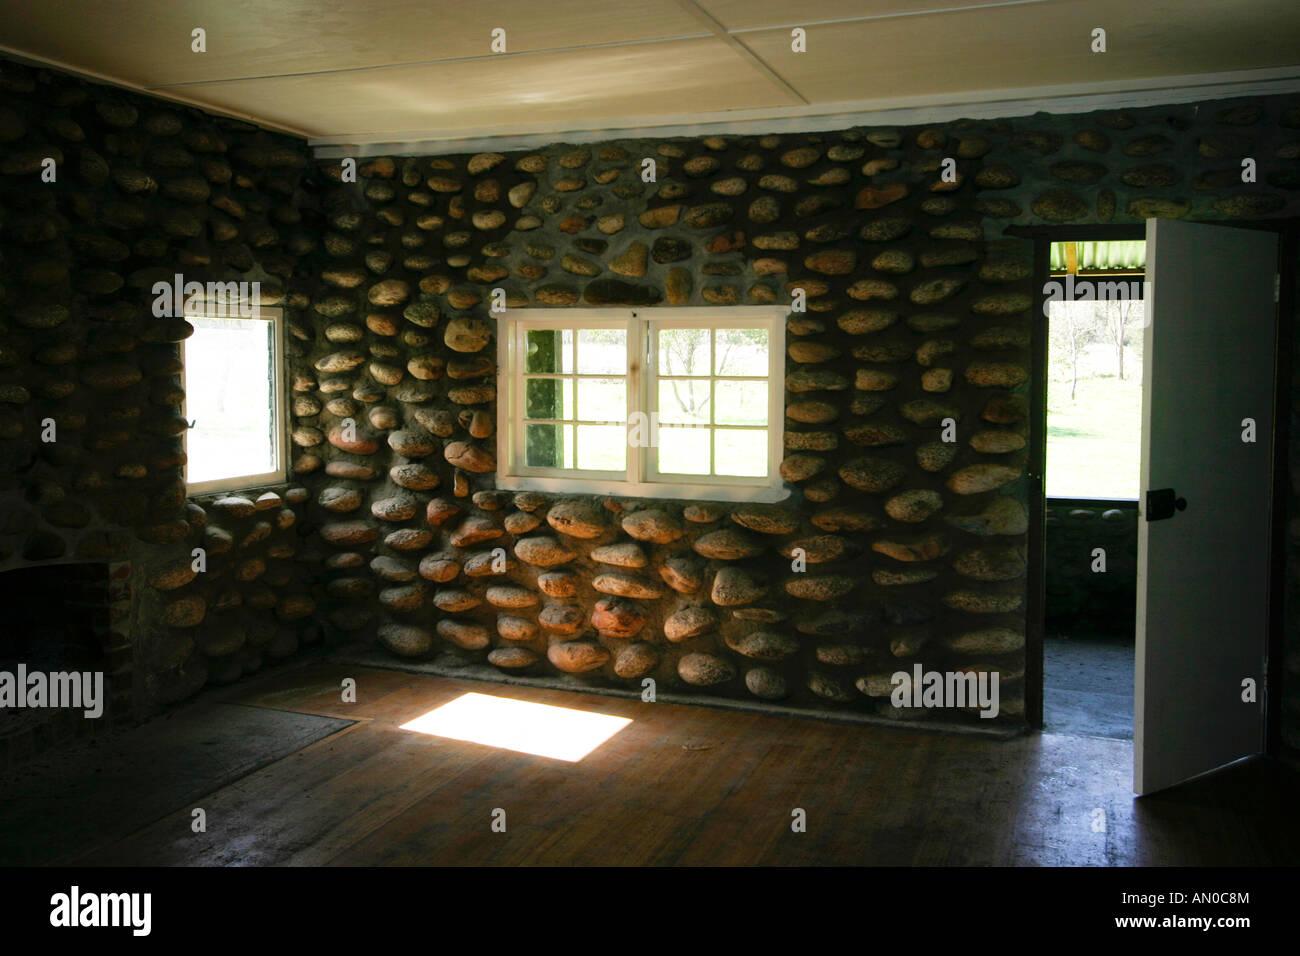 Inside of old Farmhouse Stock Photo: 15370531 - Alamy for Old Farmhouse Inside  199fiz